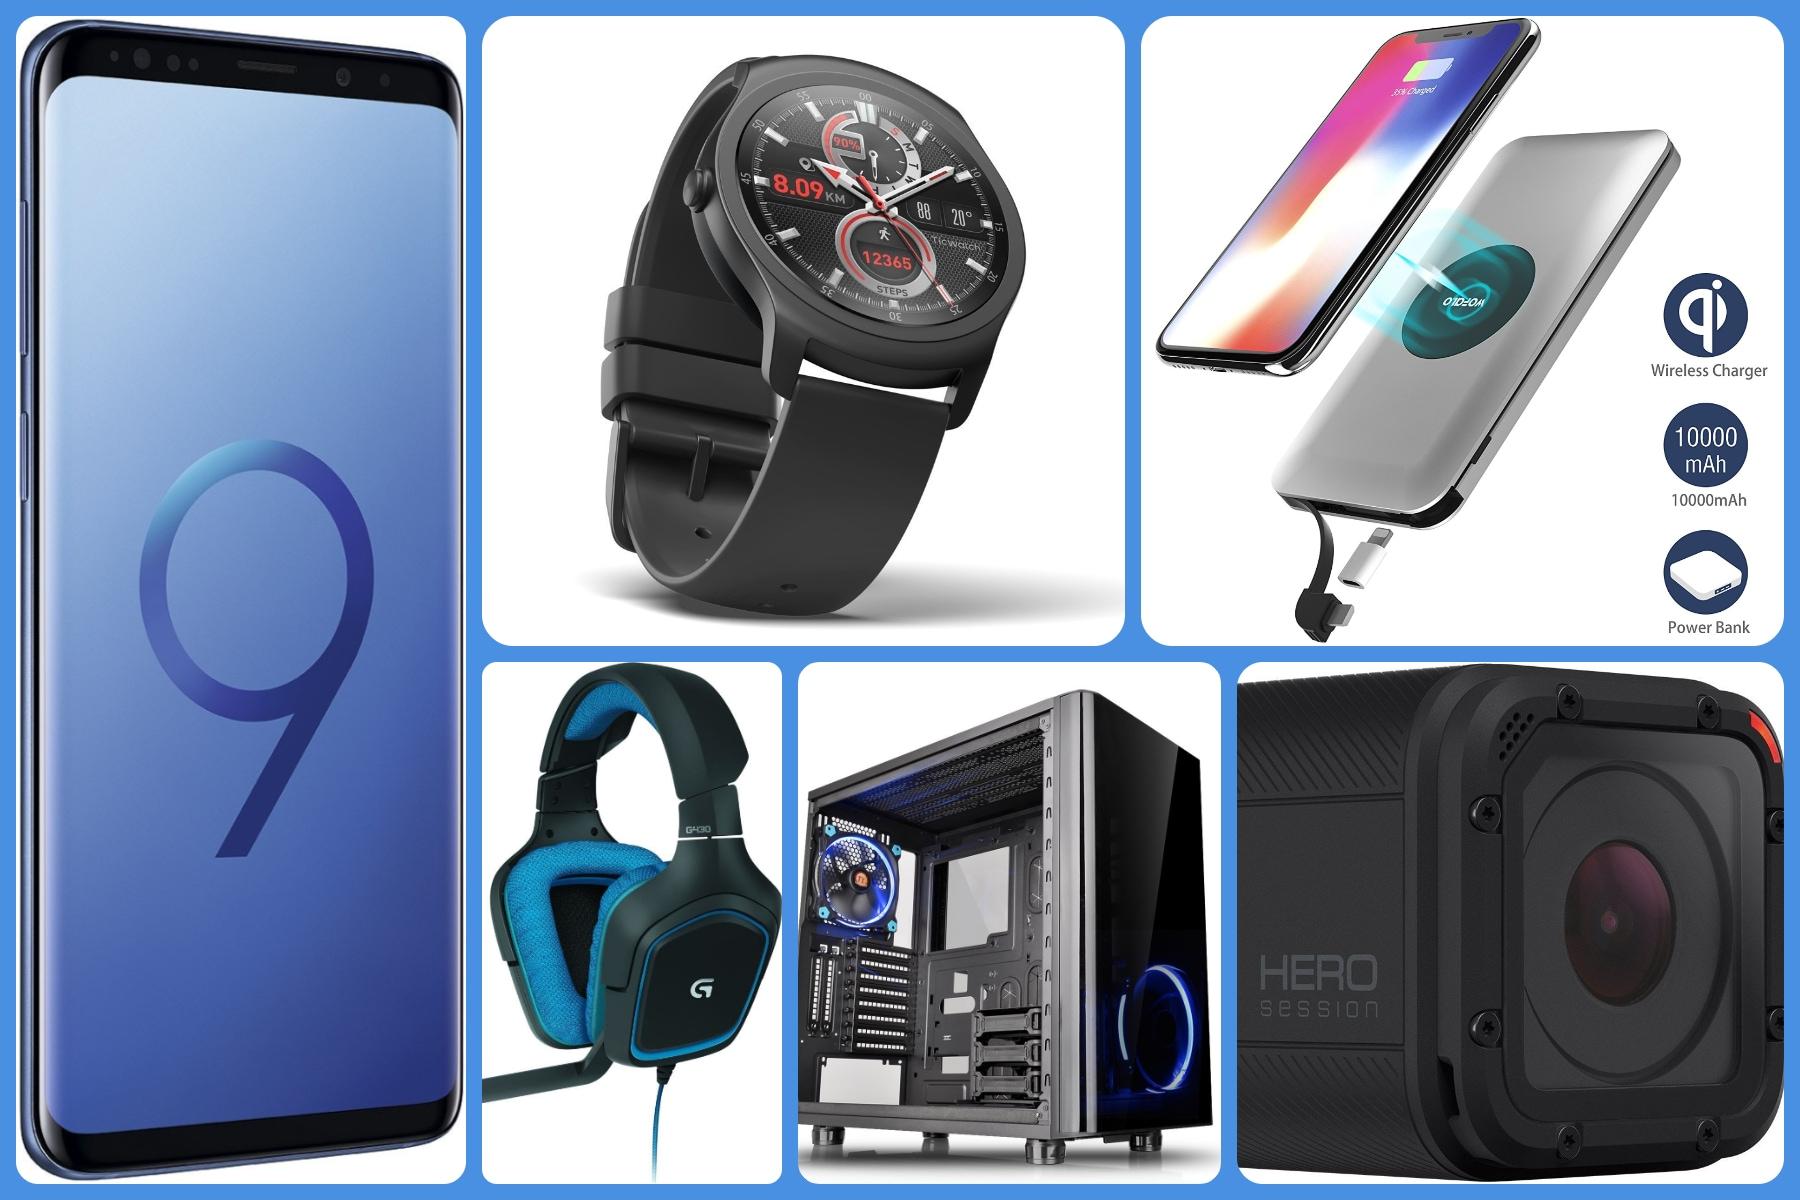 Su Amazon in offerta: Galaxy S9, power bank wireless, Hero Session, cuffie gaming - image migliori-offerte-amazon-22-marzo-2018 on http://www.zxbyte.com